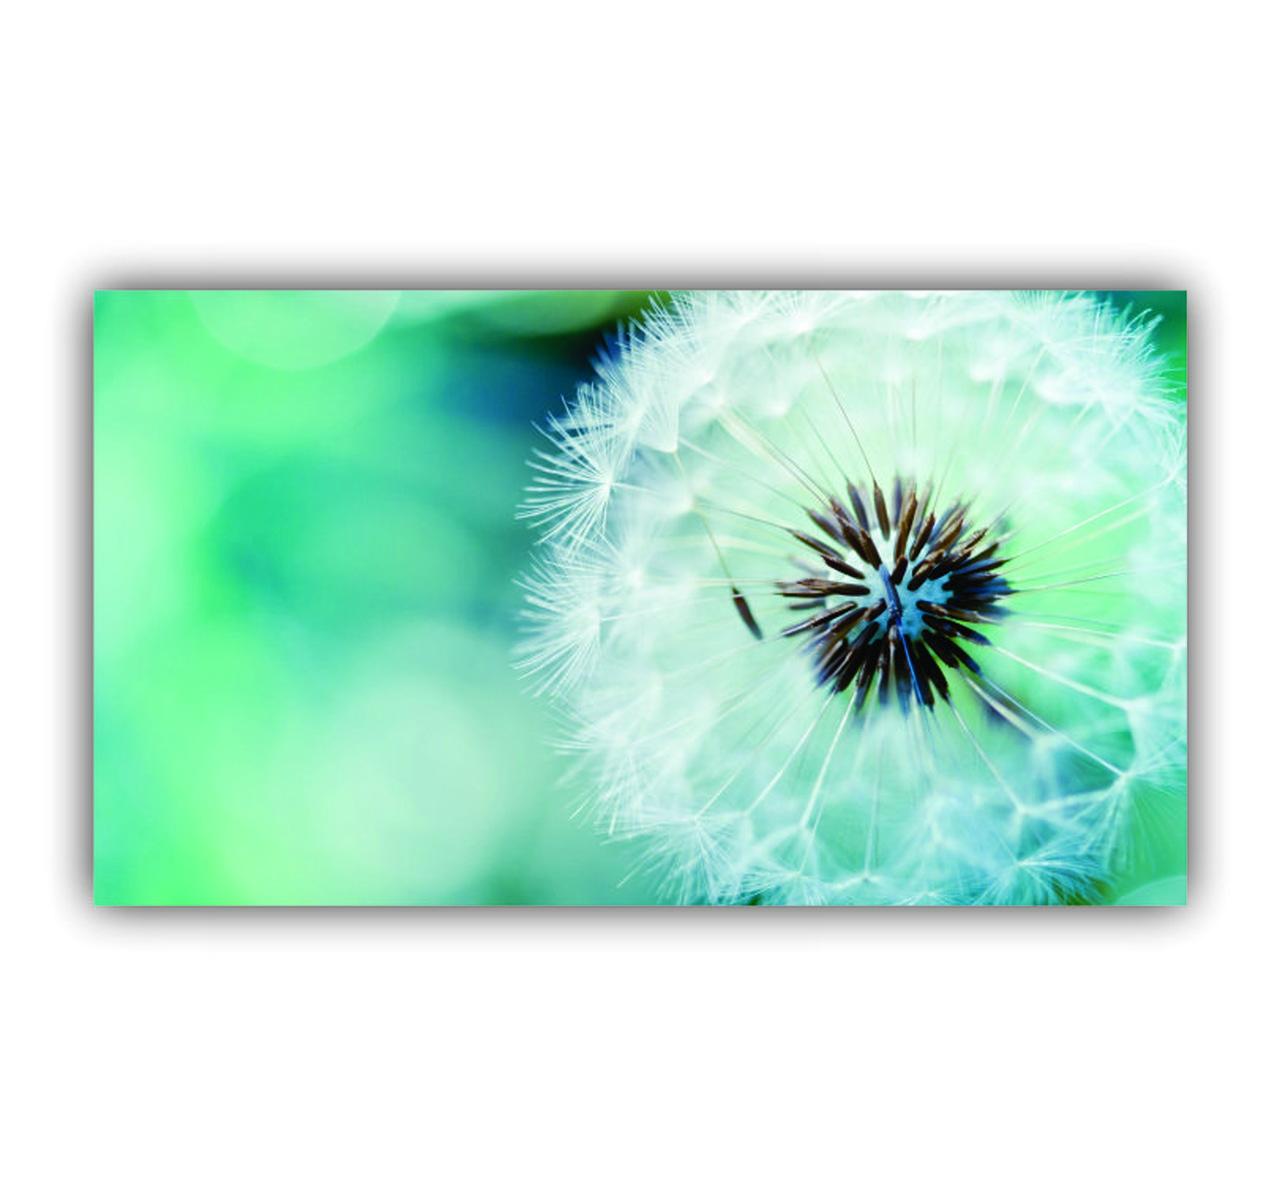 Quadro Flor Delicada Azul e Branco Clean - Tela Única